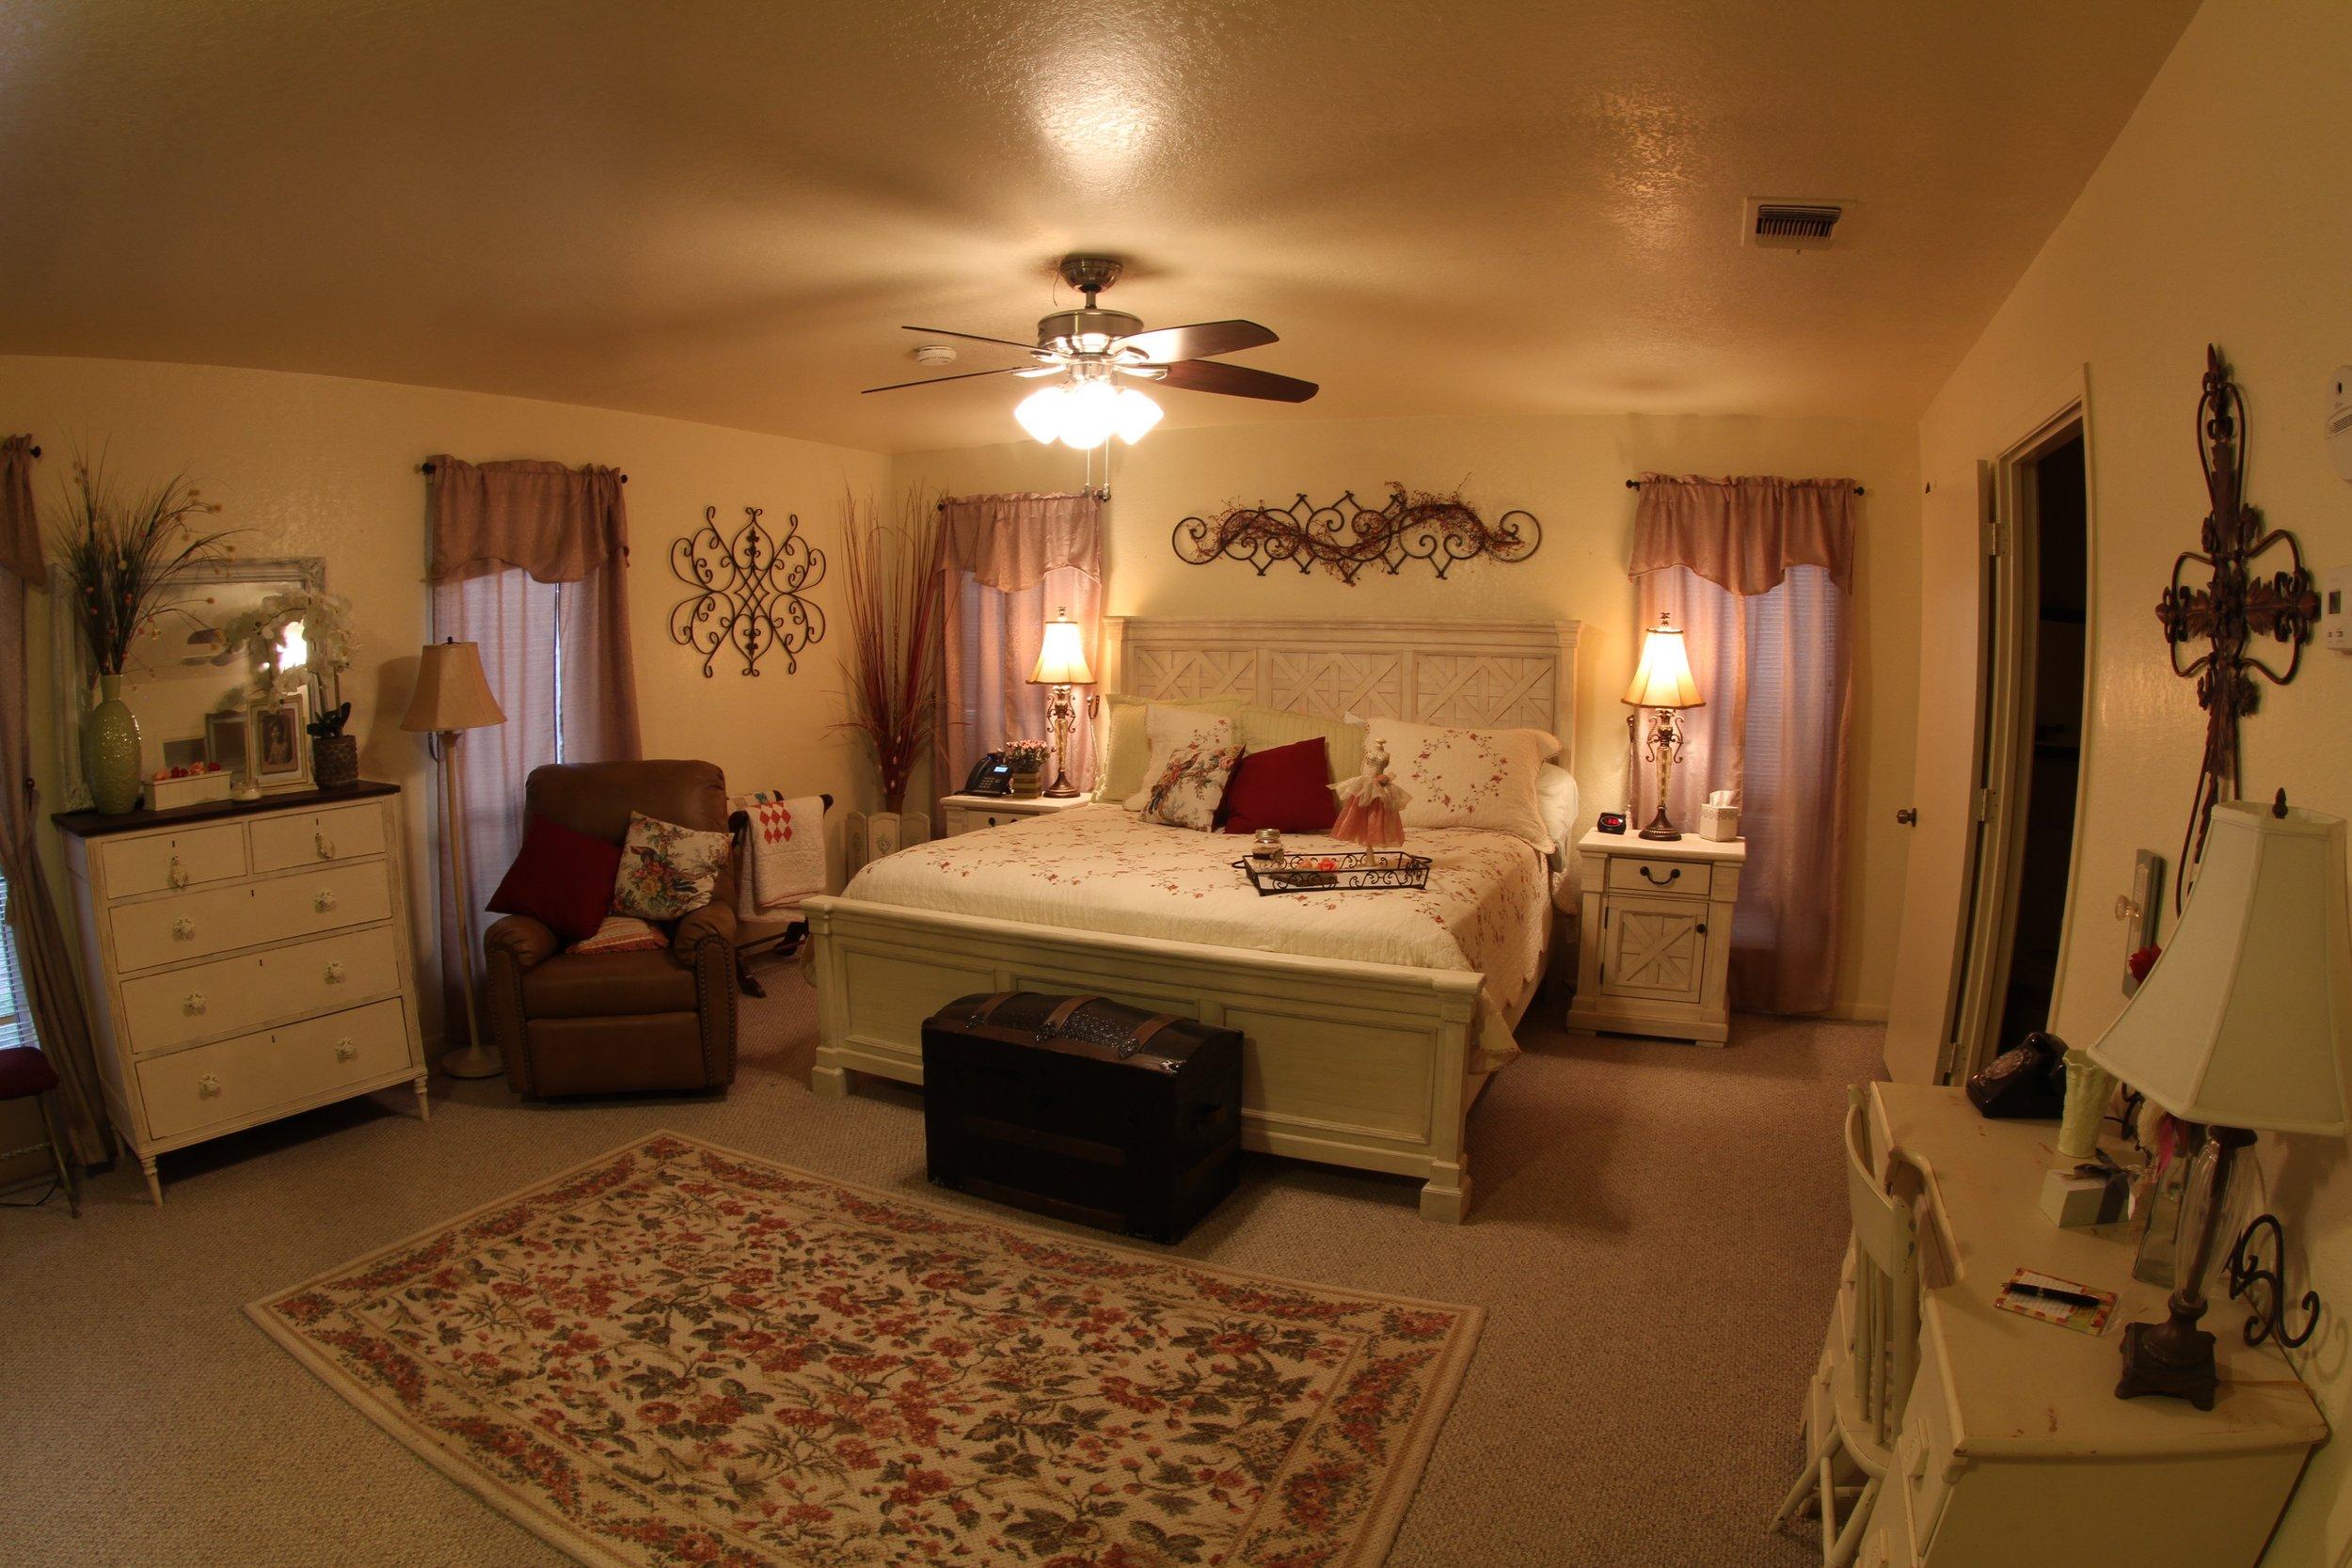 The Grande Bedroom